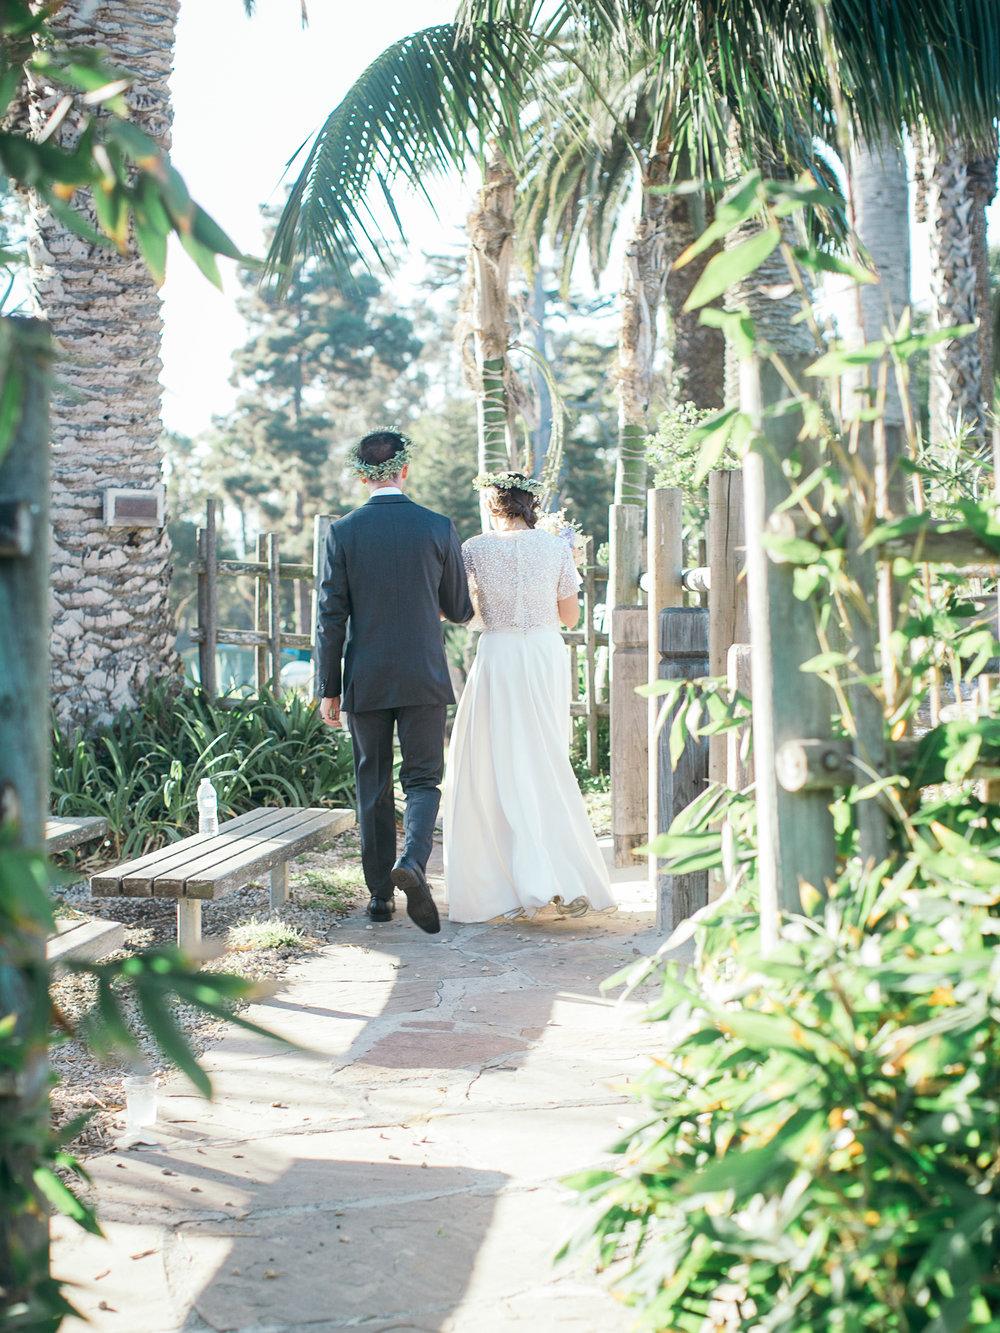 www.santabarbarawedding.com | Santa Barbara Zoo | Kiel Rucker | Rincon Catering | Bride and Groom